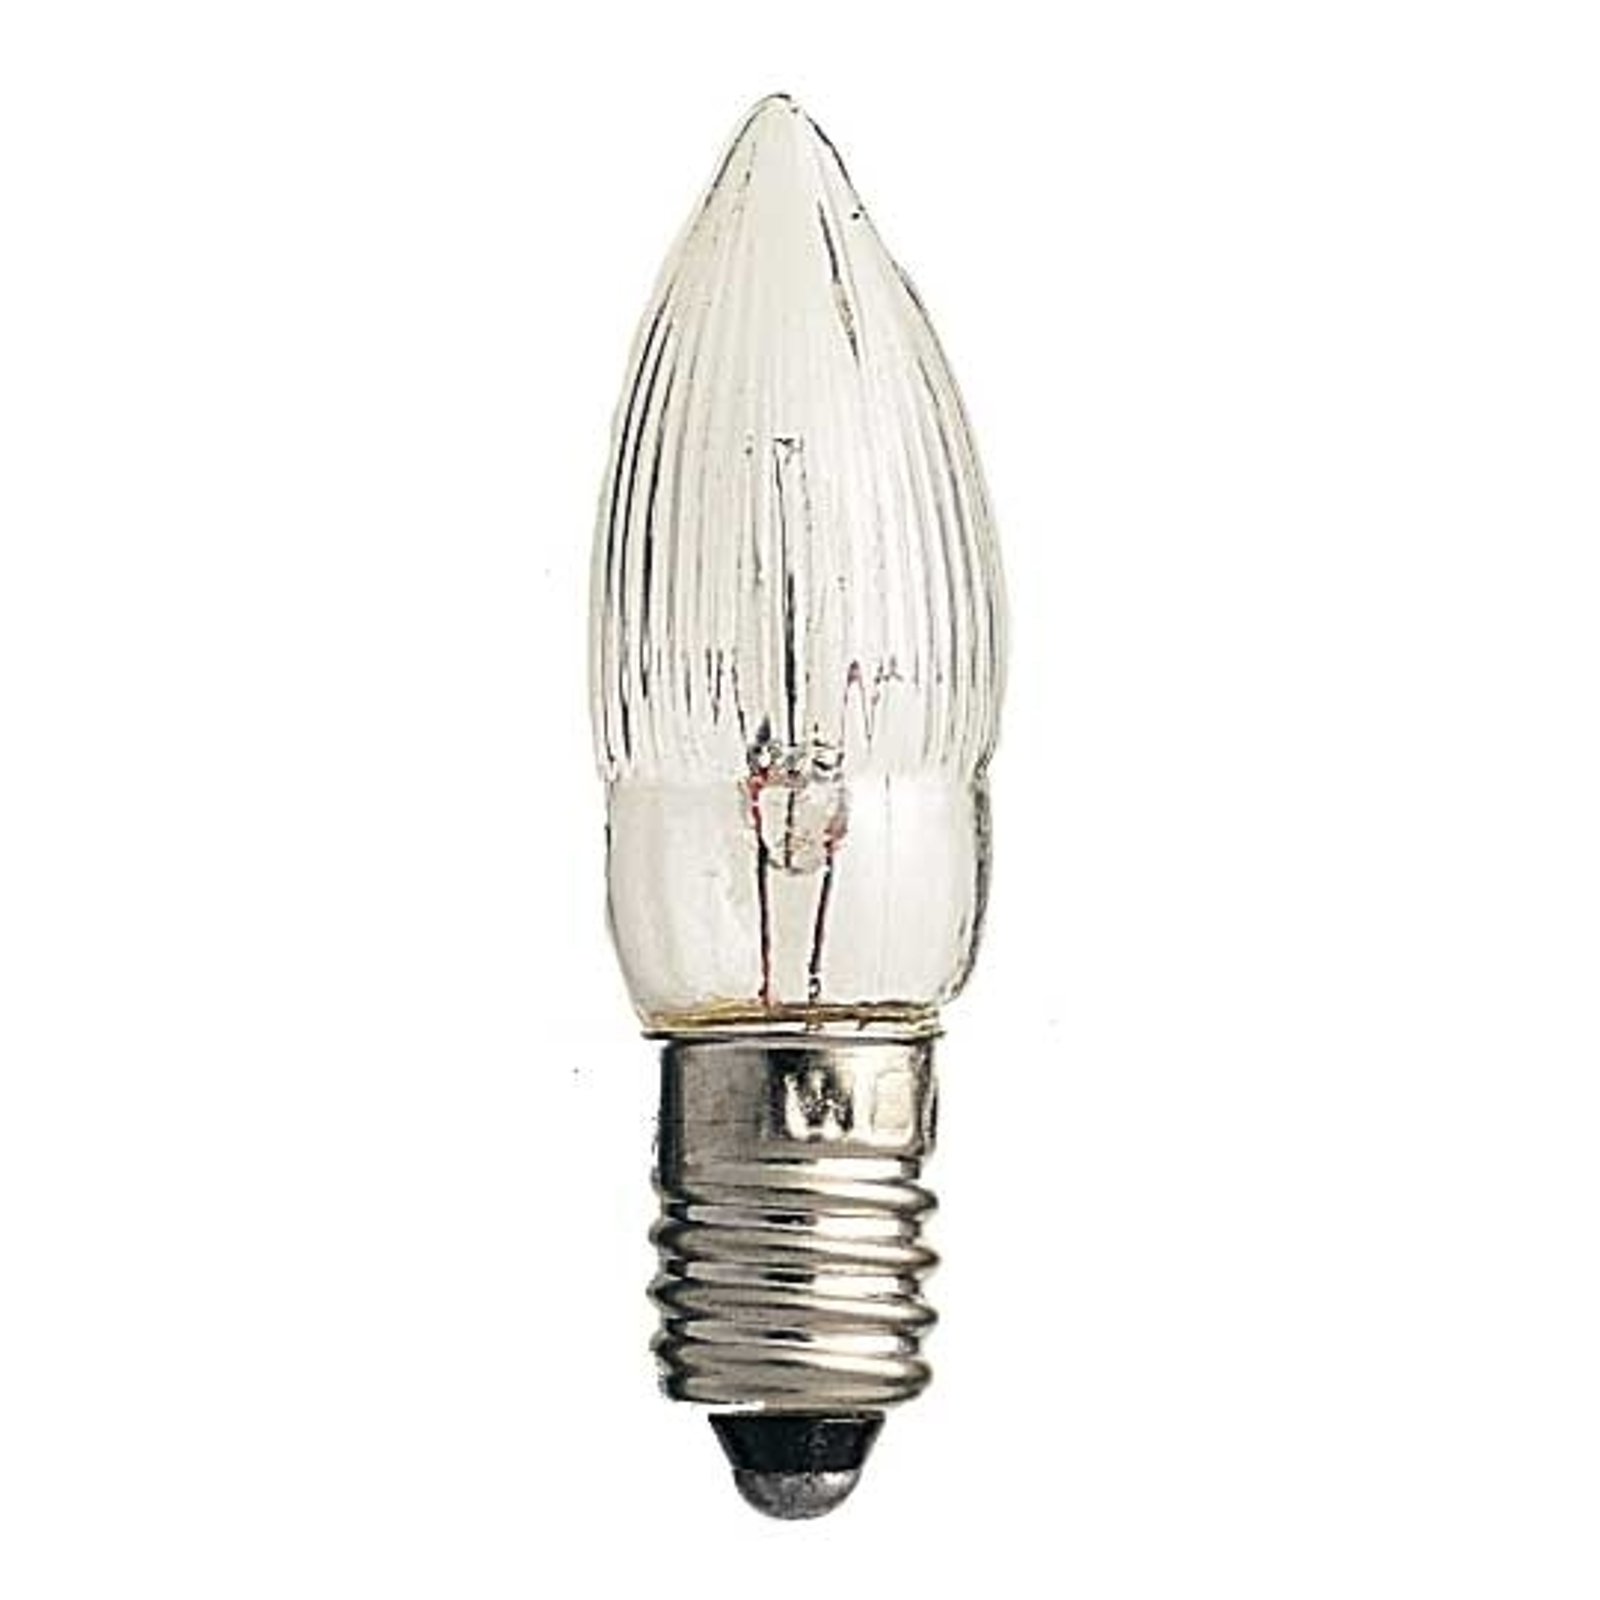 E10 3W 14V Reservlampor 3dels pack ljusform